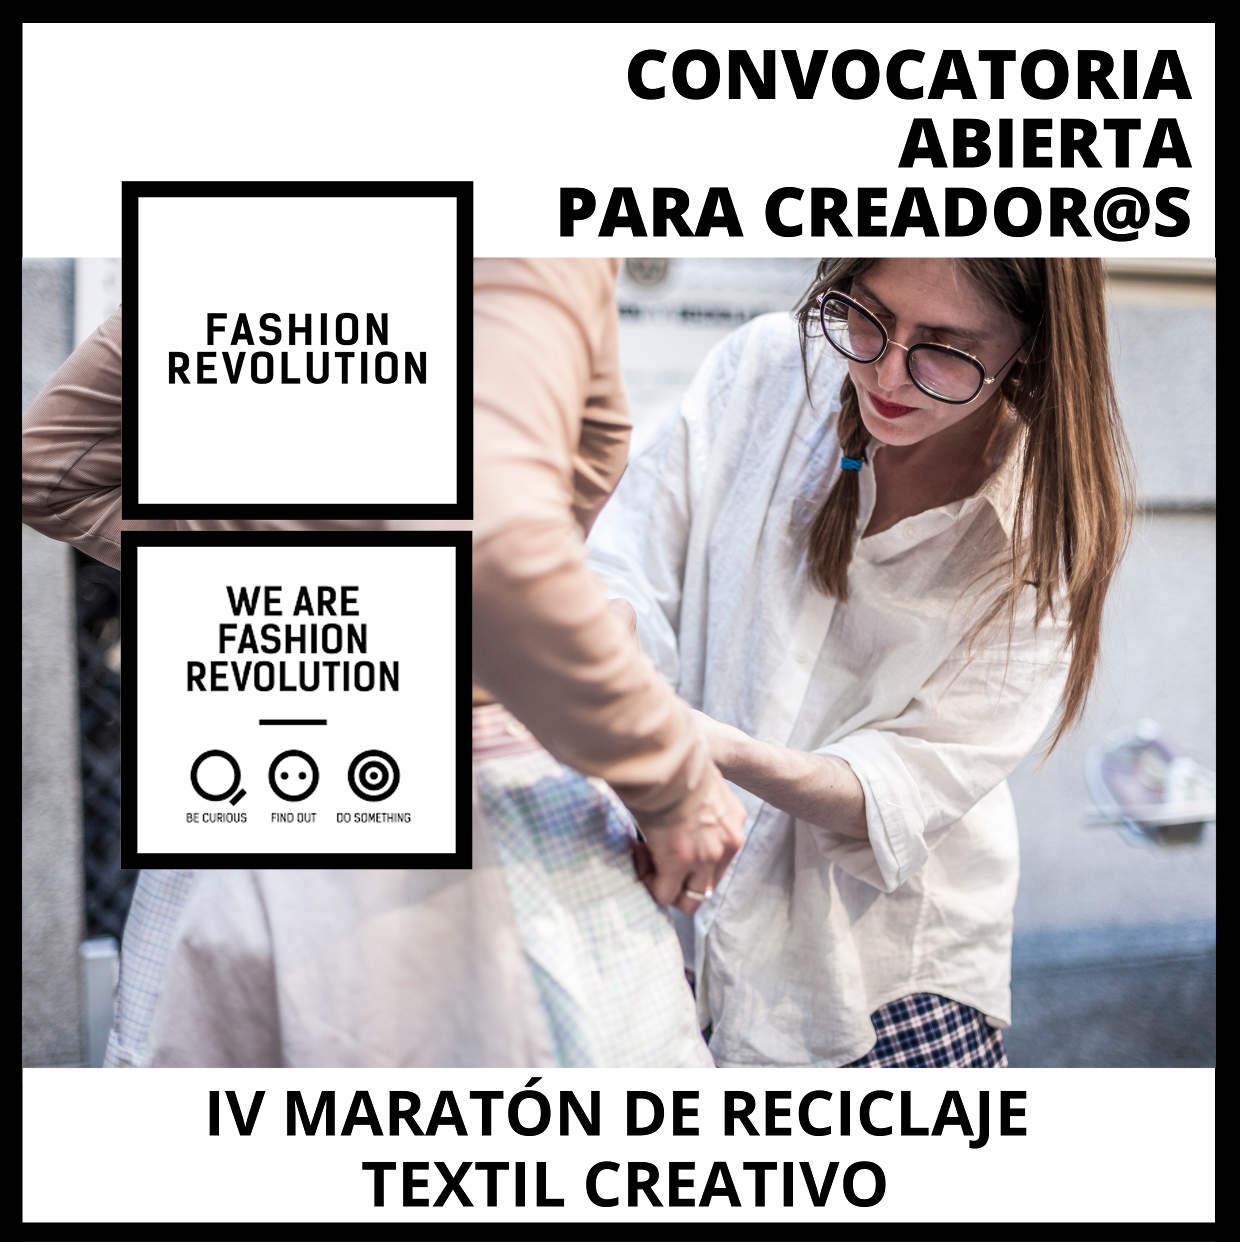 eefd3a0e67a5 Este se convertirá en un espacio de encuentro donde tendrán lugar  diferentes actividades en torno al reciclaje textil creativo -upcycling-